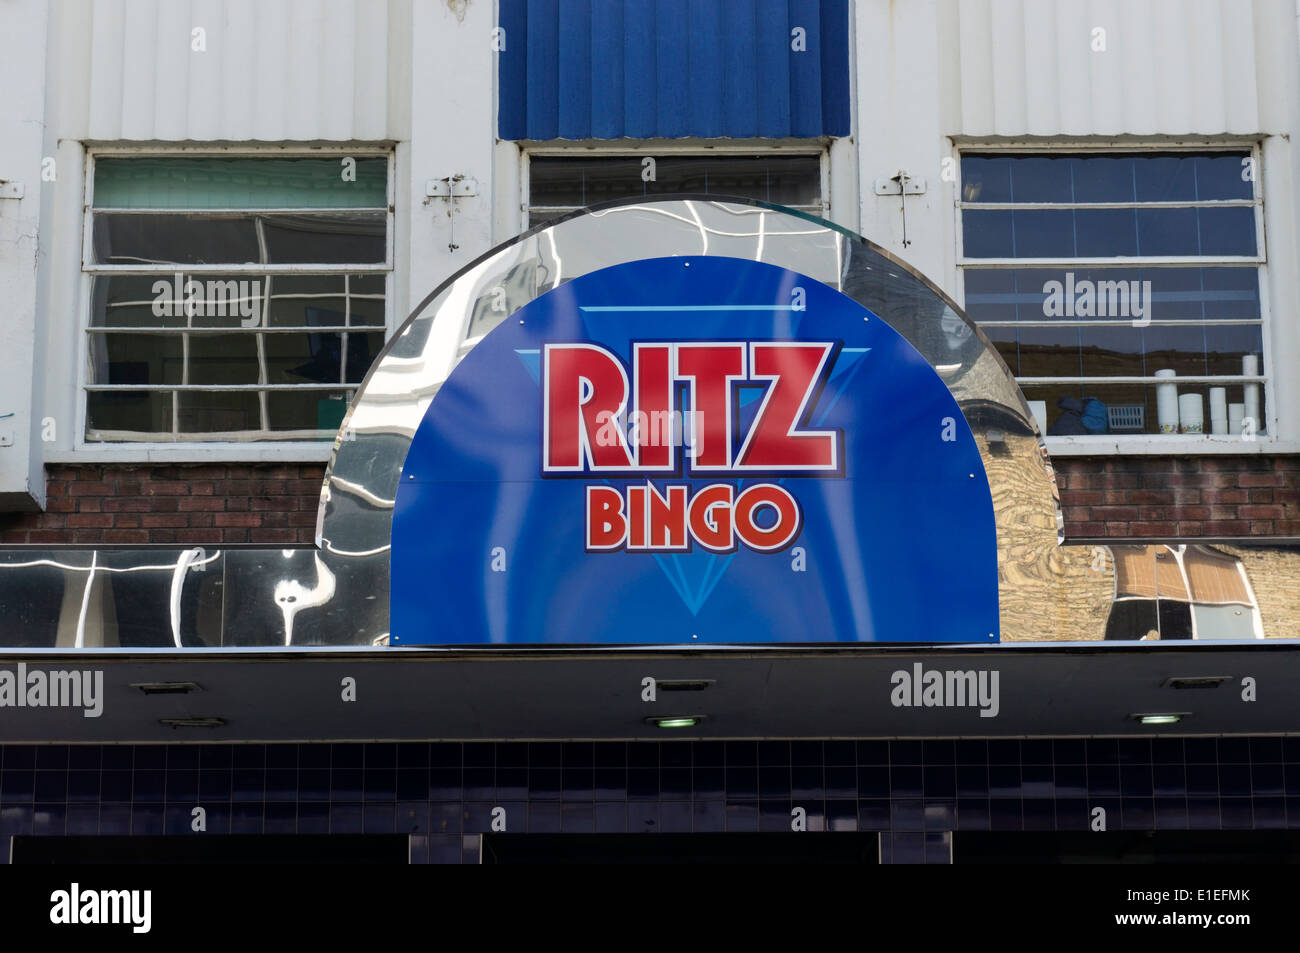 A sign for Ritz Bingo in King's Lynn, Norfolk. - Stock Image